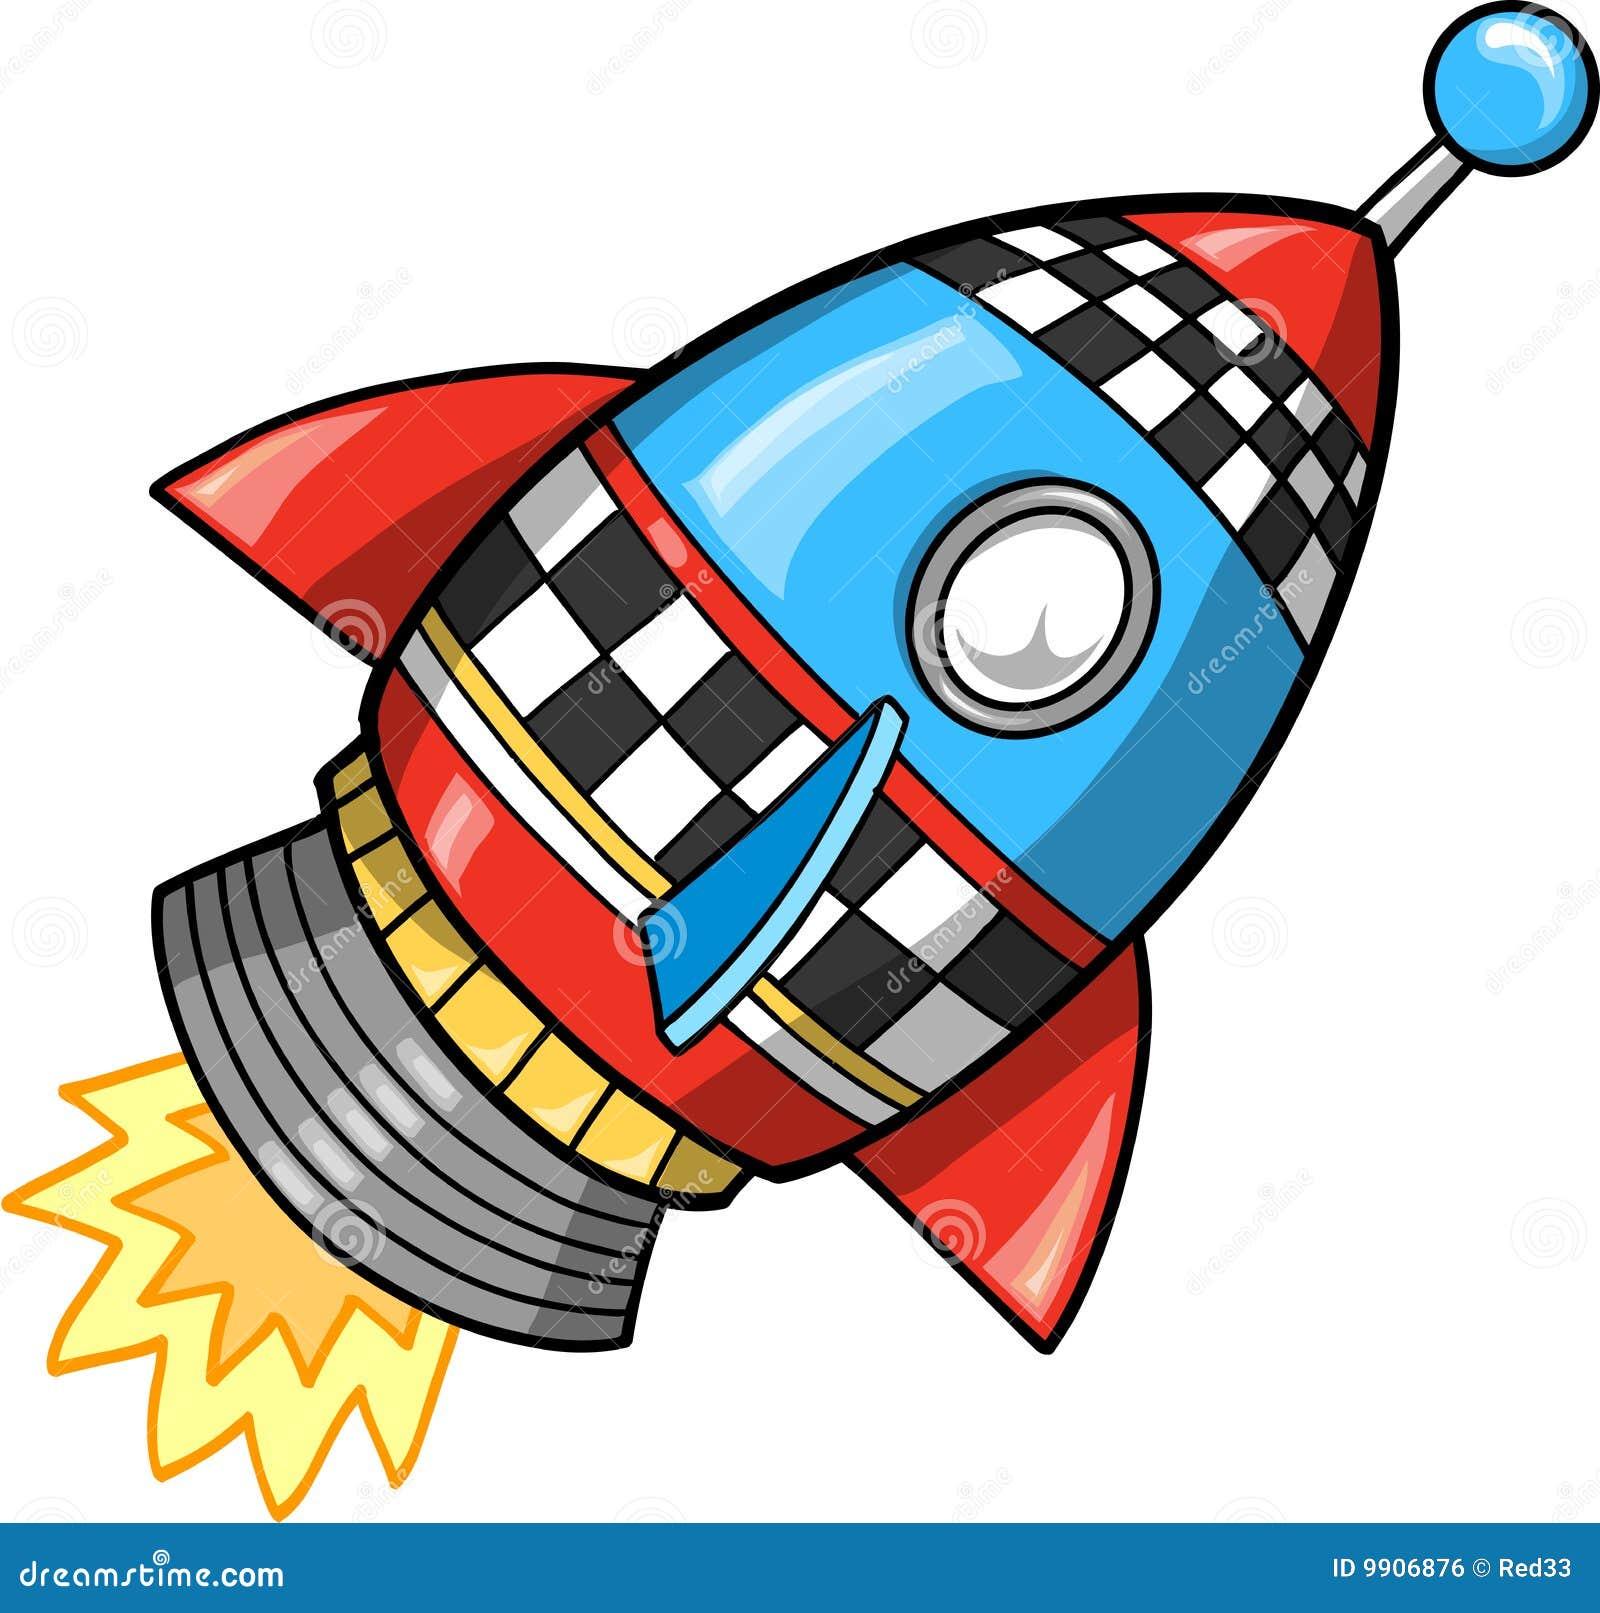 how to download rocket in unturned 2017